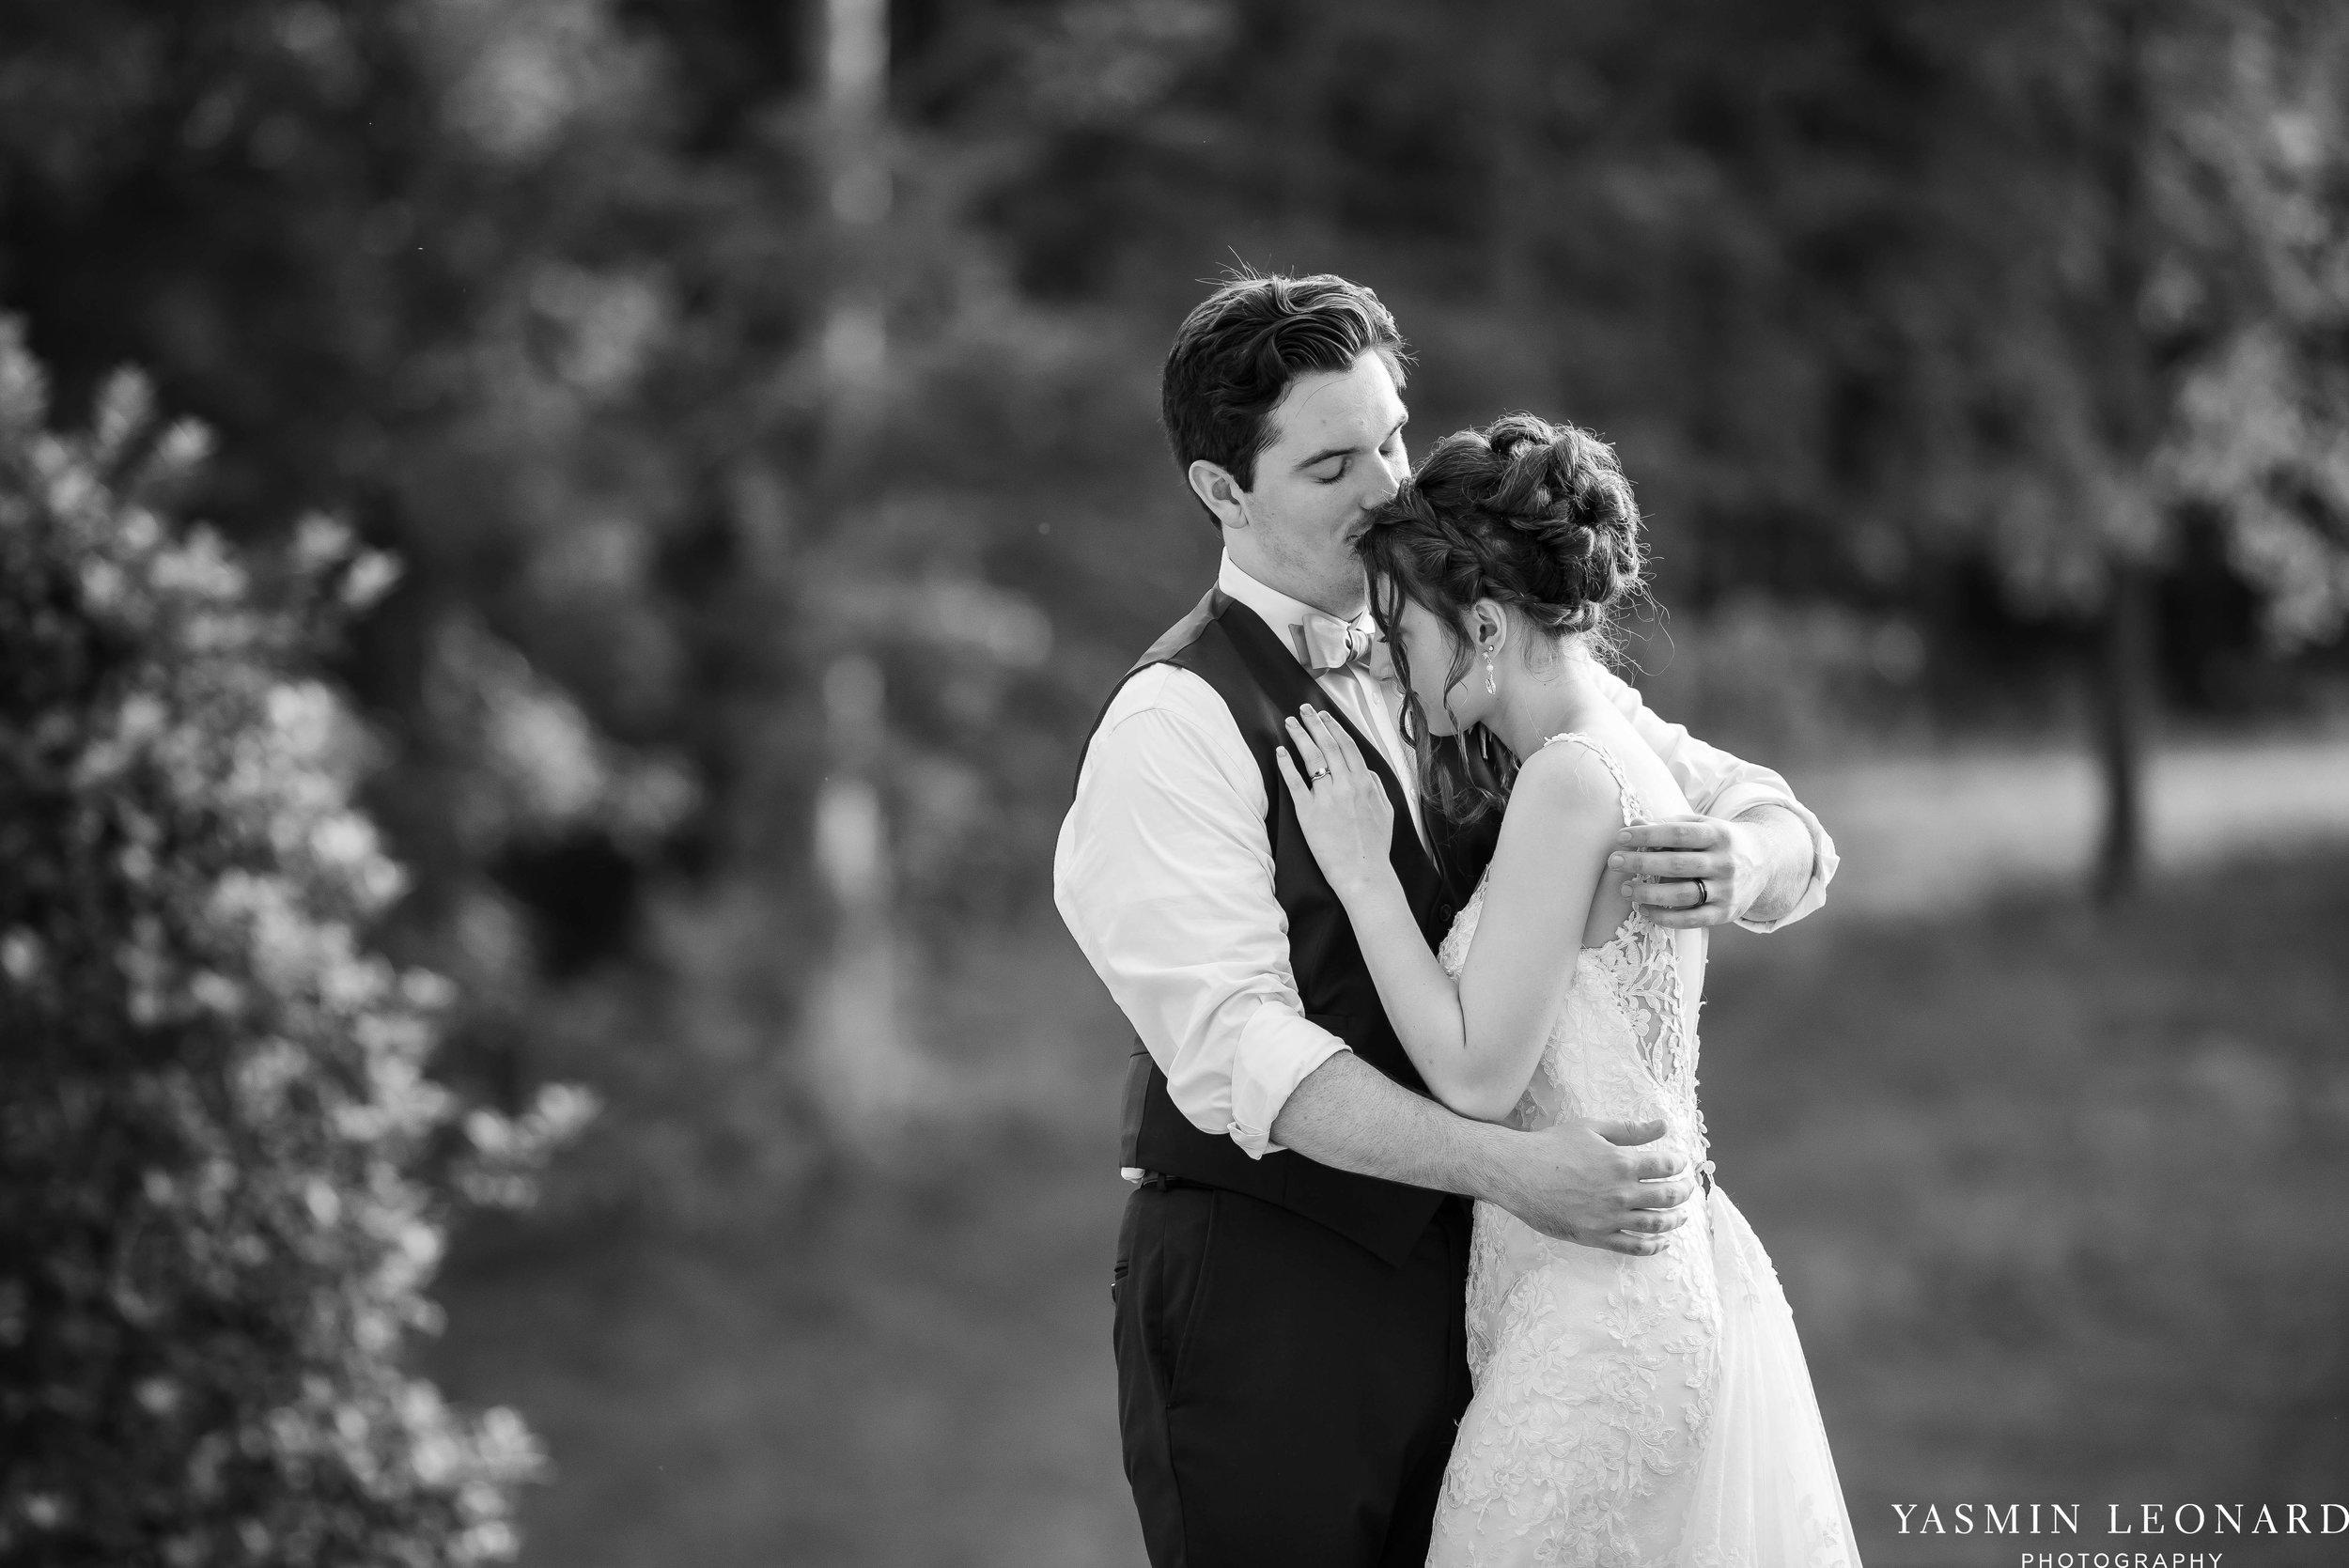 Old Homeplace Vineyard - NC Weddings - Outdoor Summer Weddings - Peony Boutique - Vineyard Wedding - NC Photographer - Yasmin Leonard Photography-62.jpg